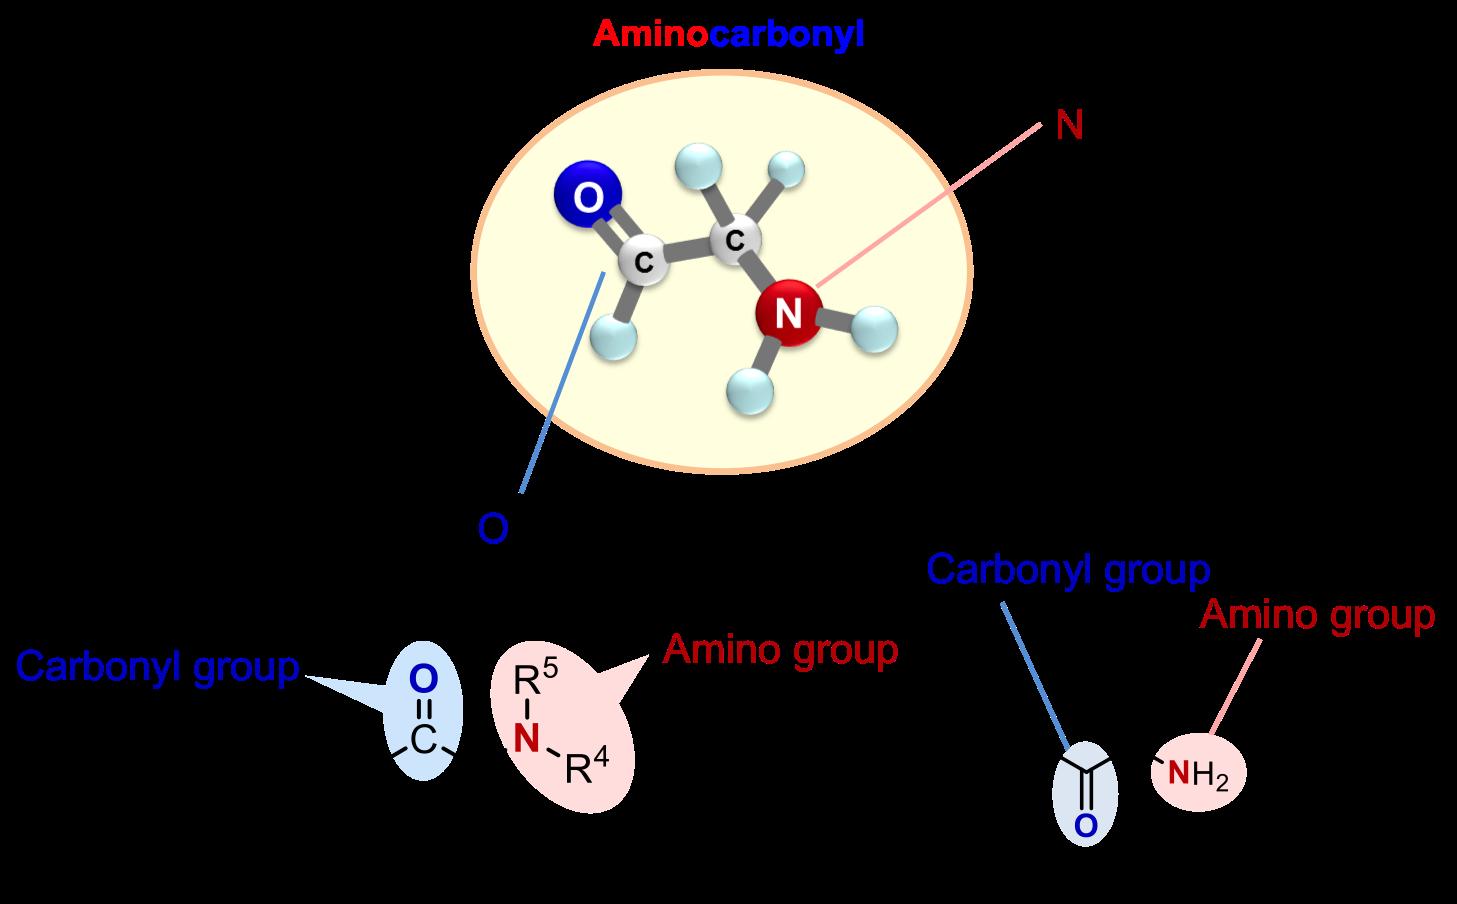 Aminocarbonyl_Figure2.png